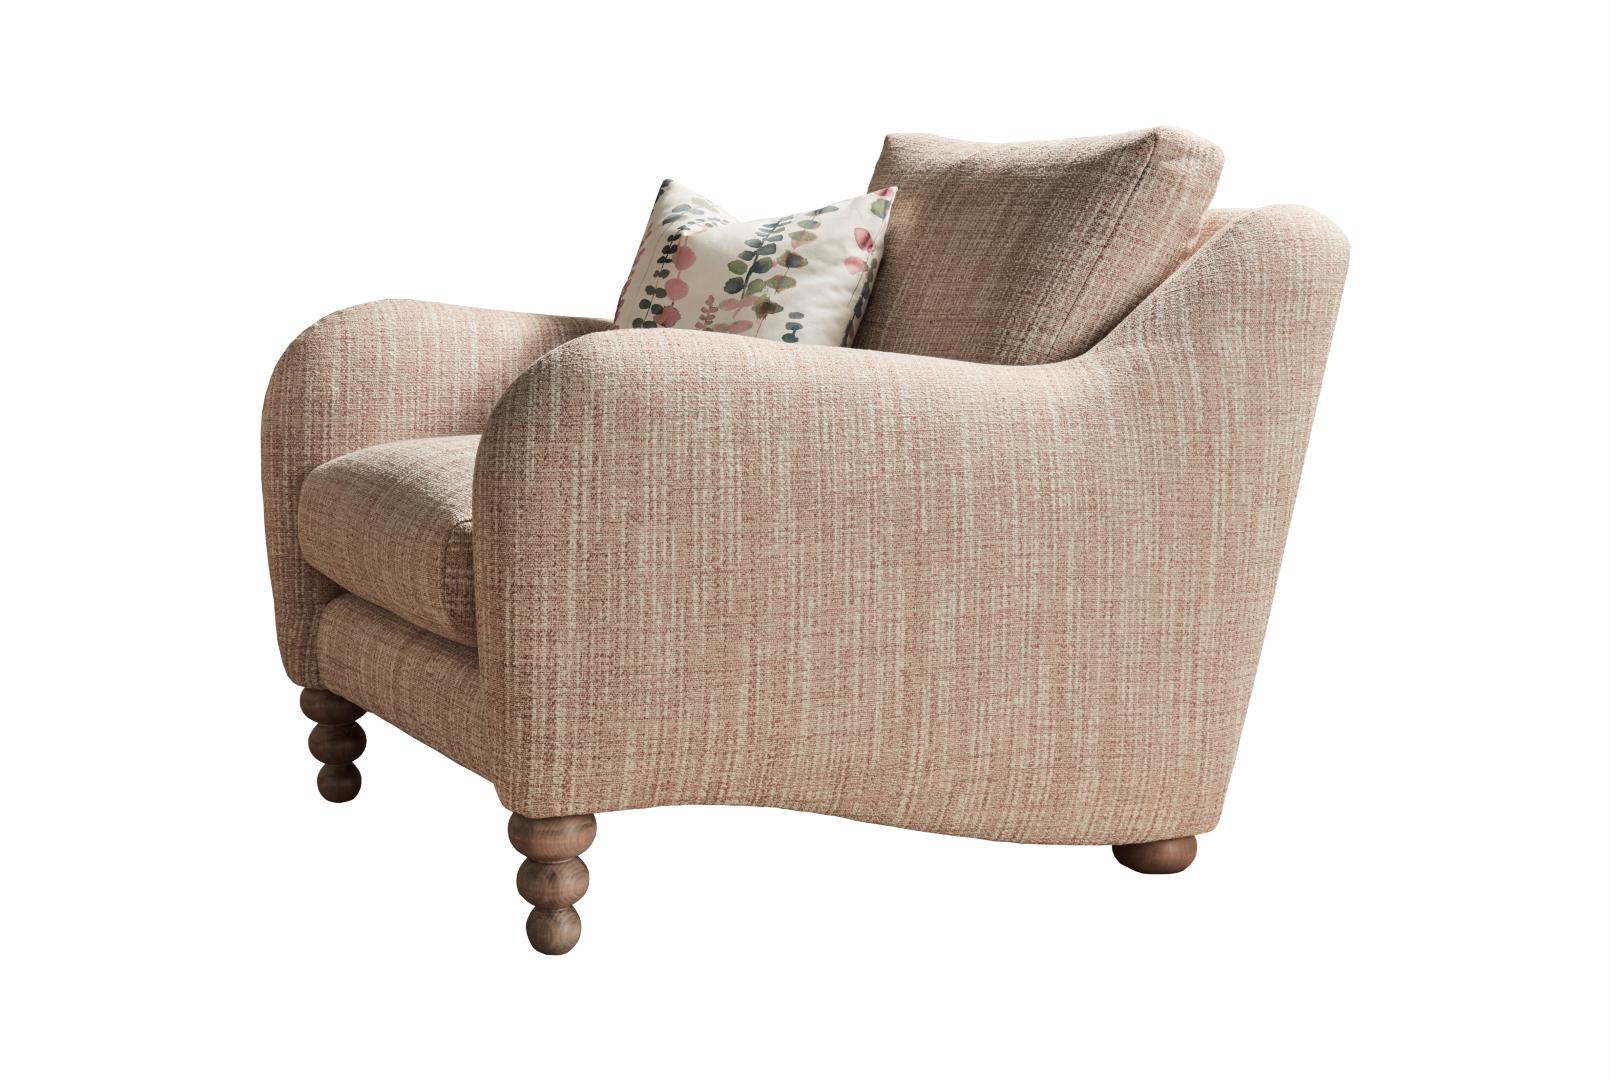 Adare Snuggler Chair